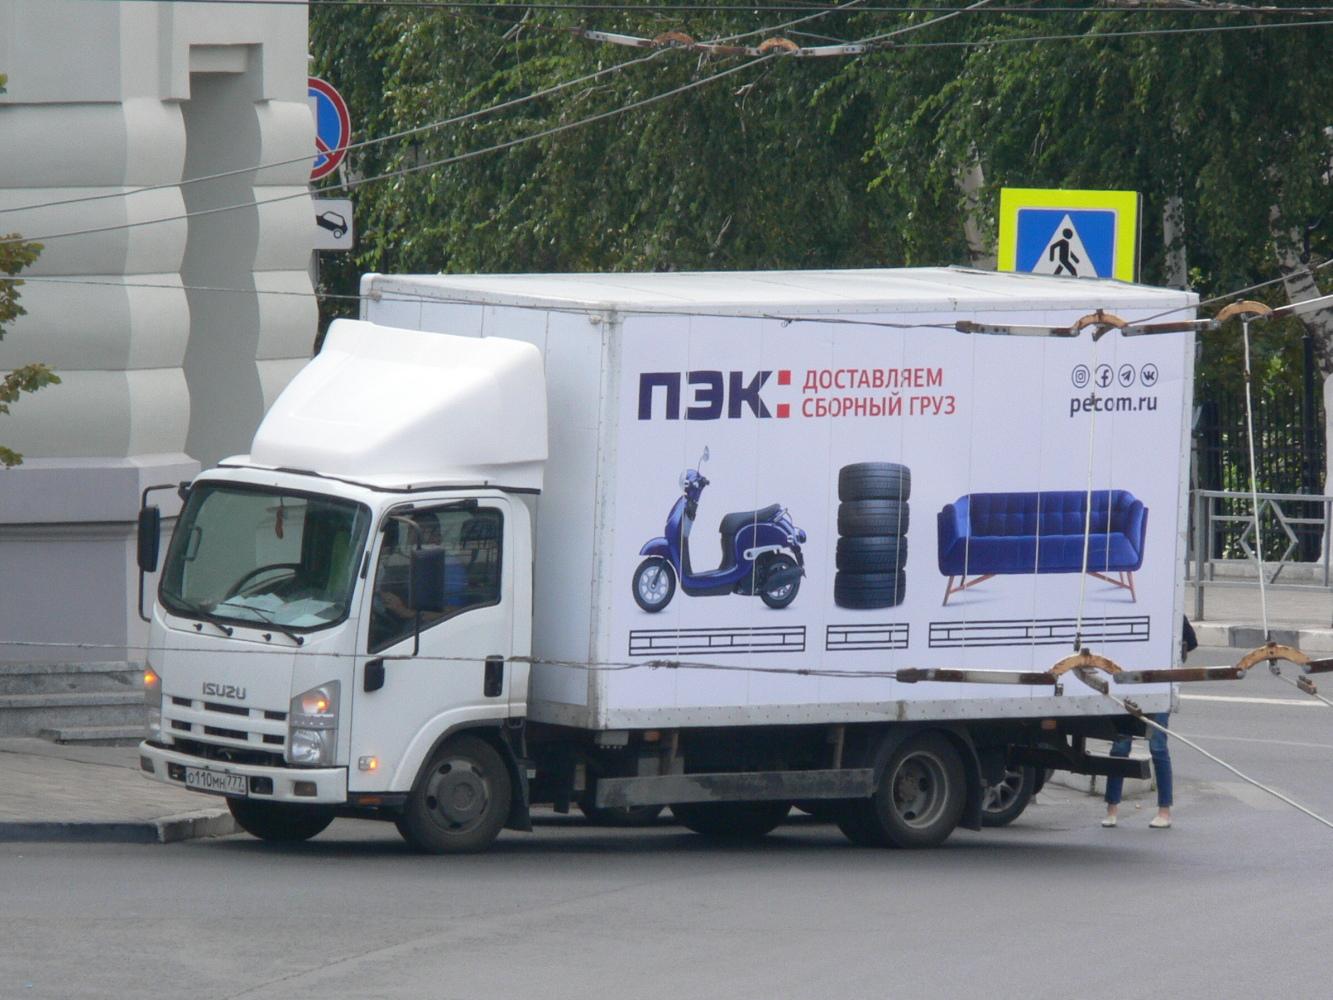 фургон на шасси ISUZU NM #О 110 МН 777. Самара, улица Куйбышева